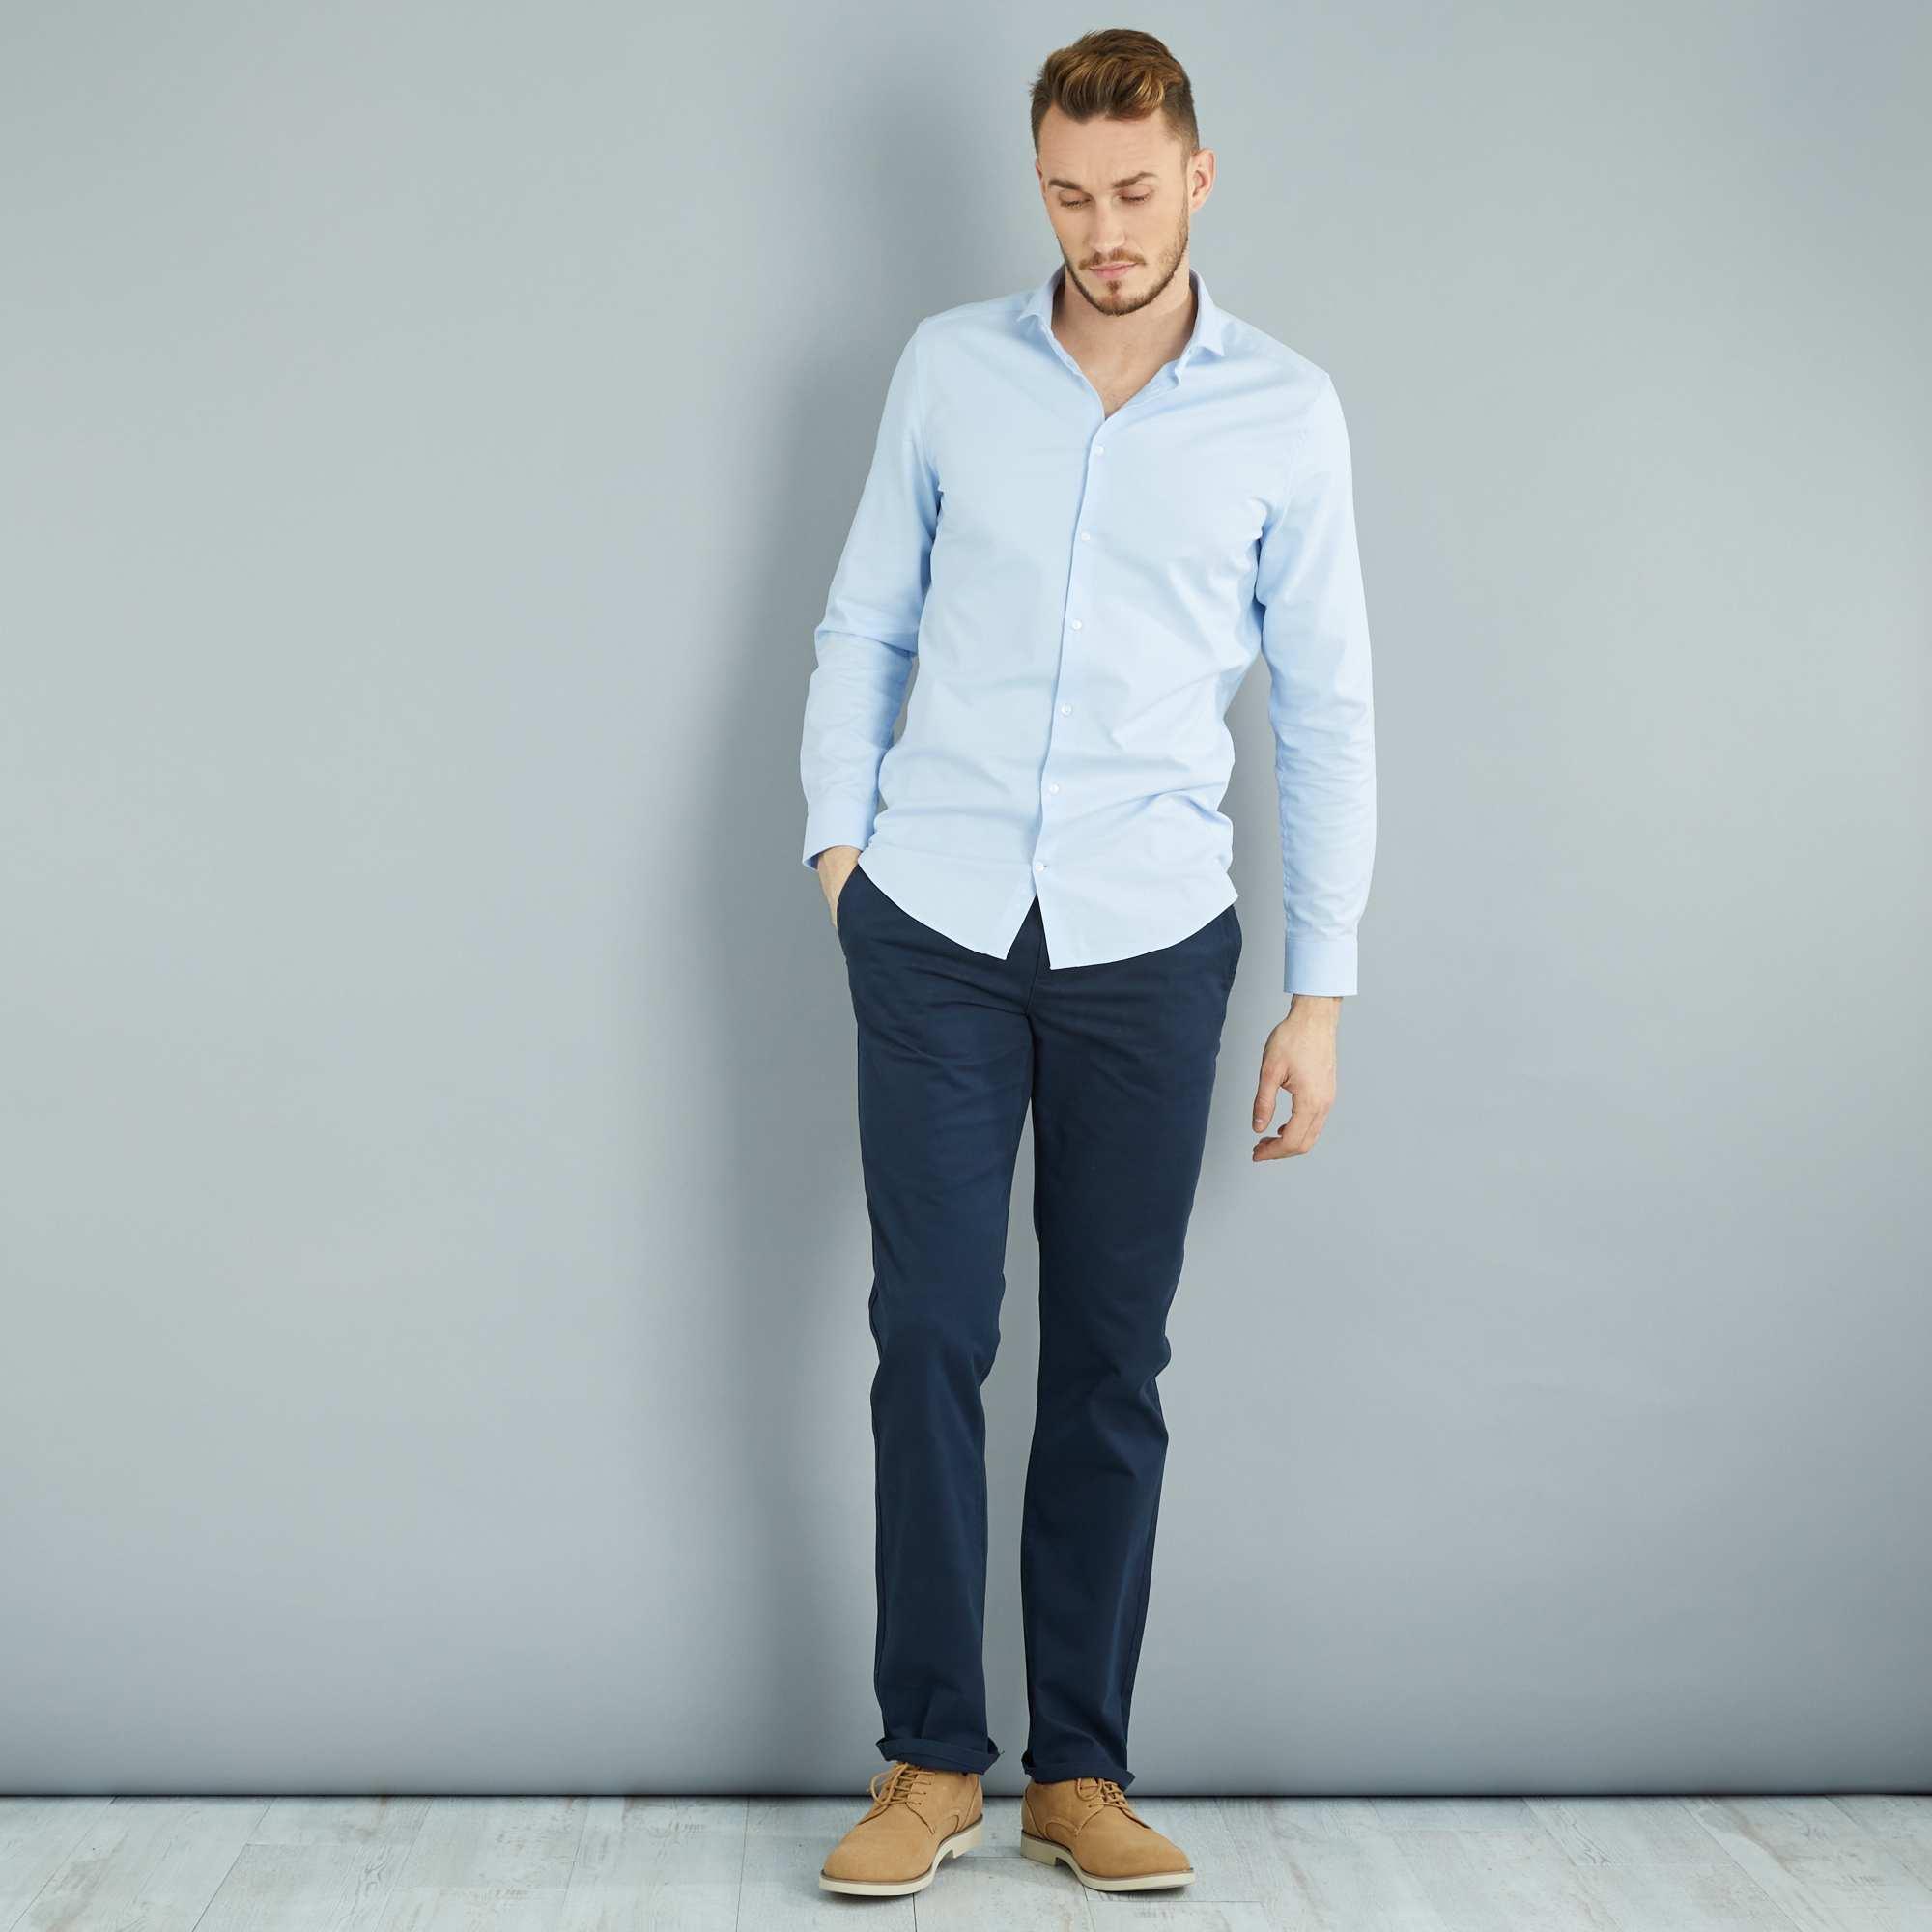 pantalon chino regular pur coton l36 1m90 homme bleu marine kiabi 22 00. Black Bedroom Furniture Sets. Home Design Ideas